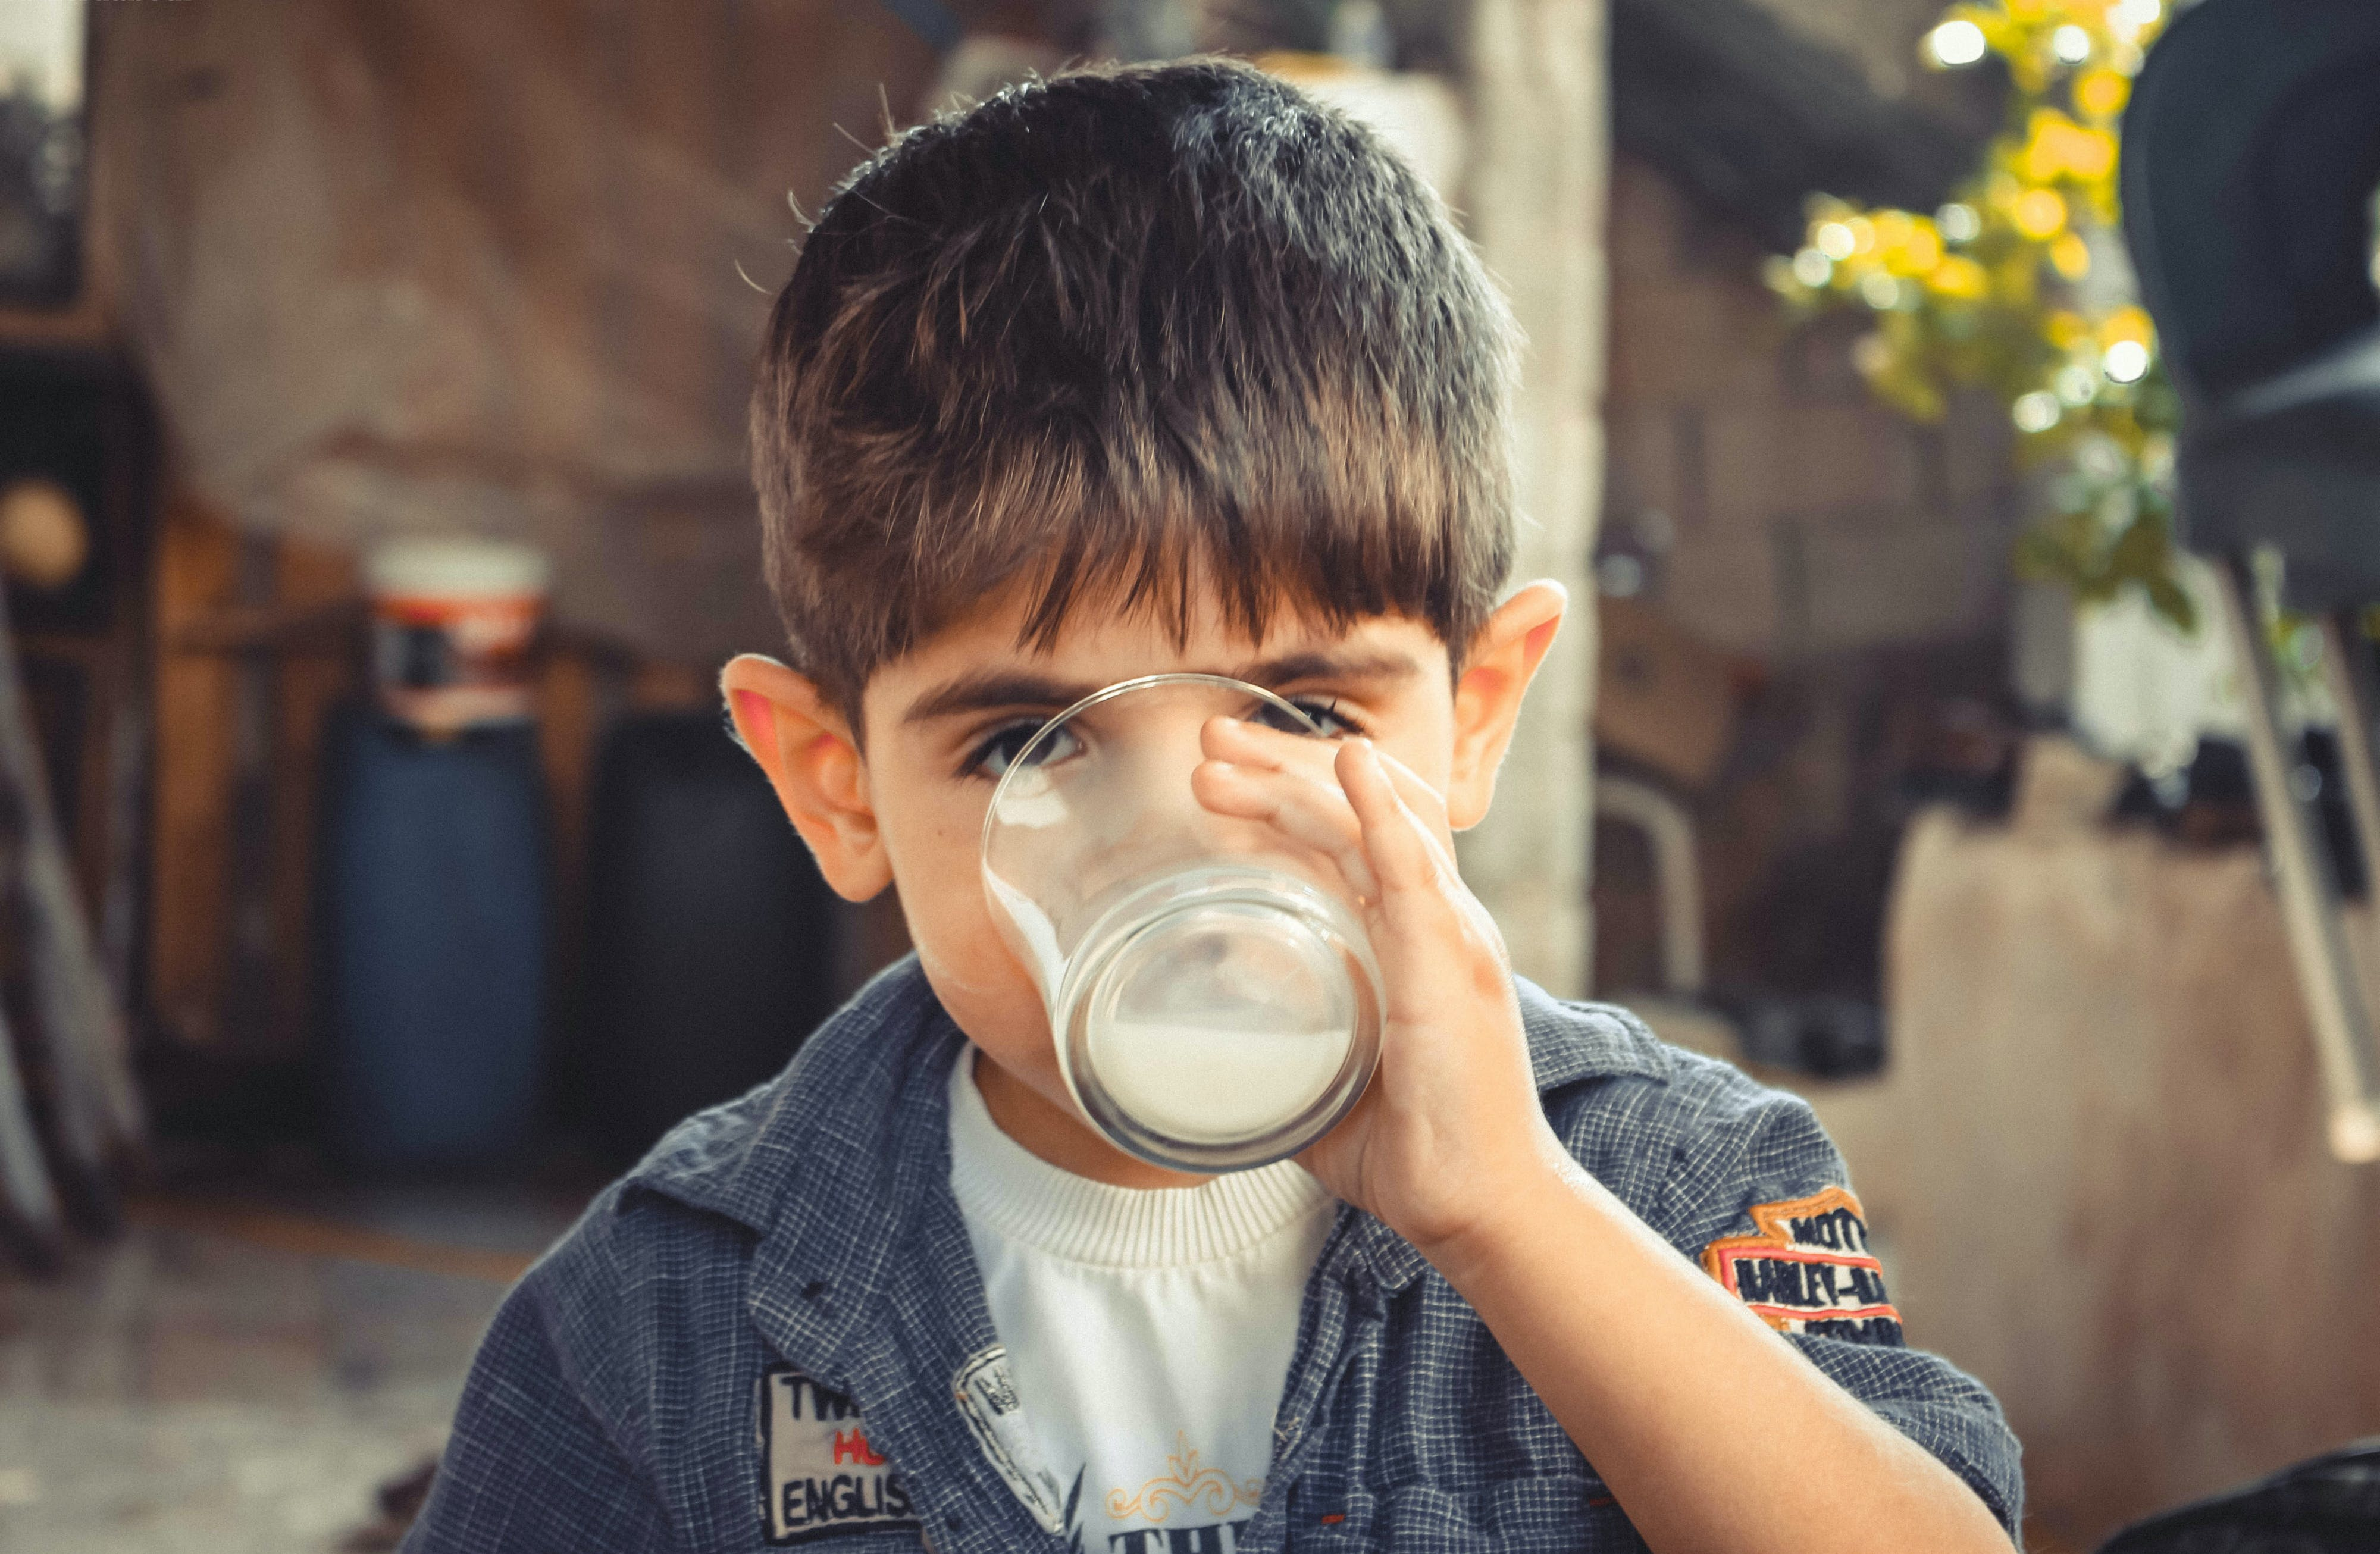 мальчик, молоко, питье